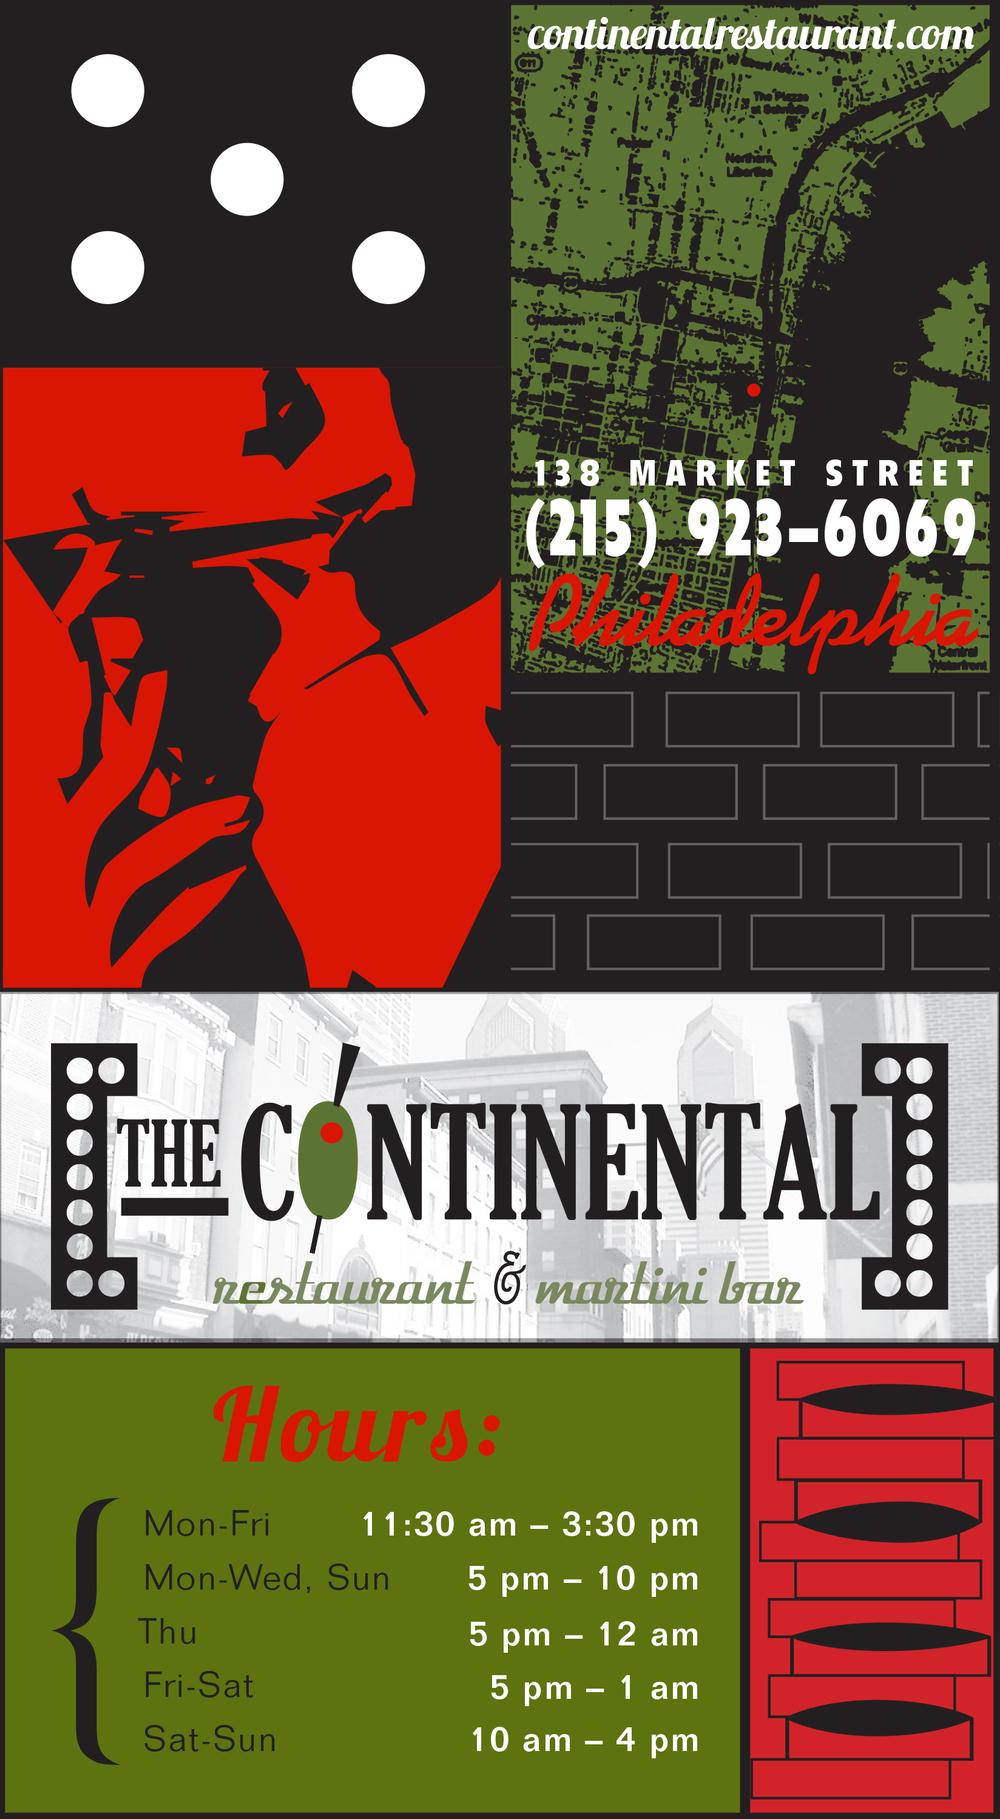 Continental Rebranding